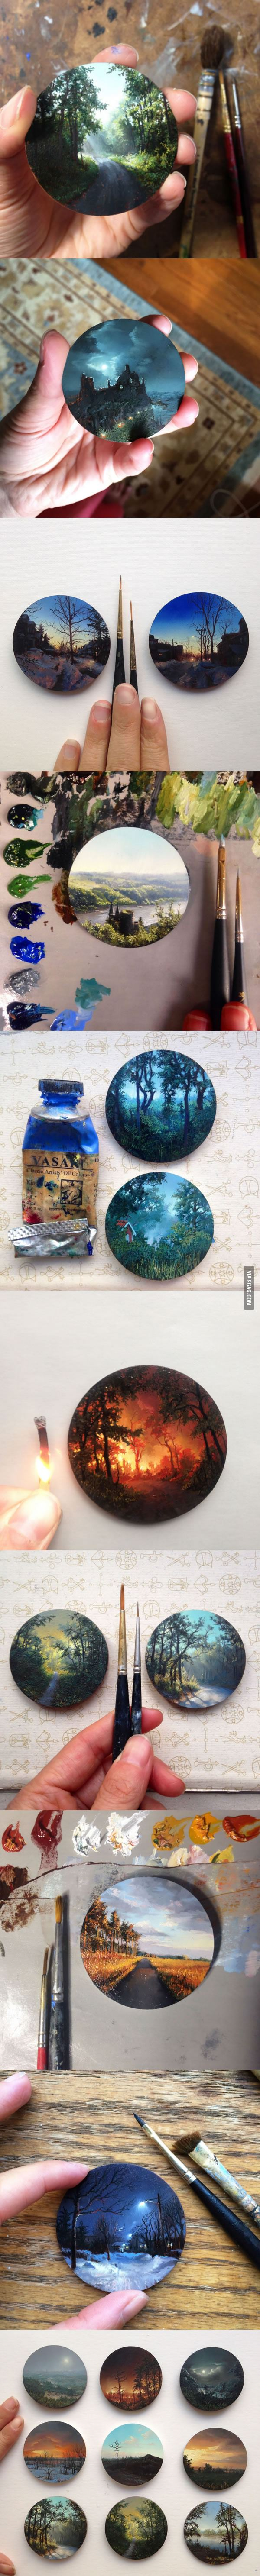 Coasterscapes